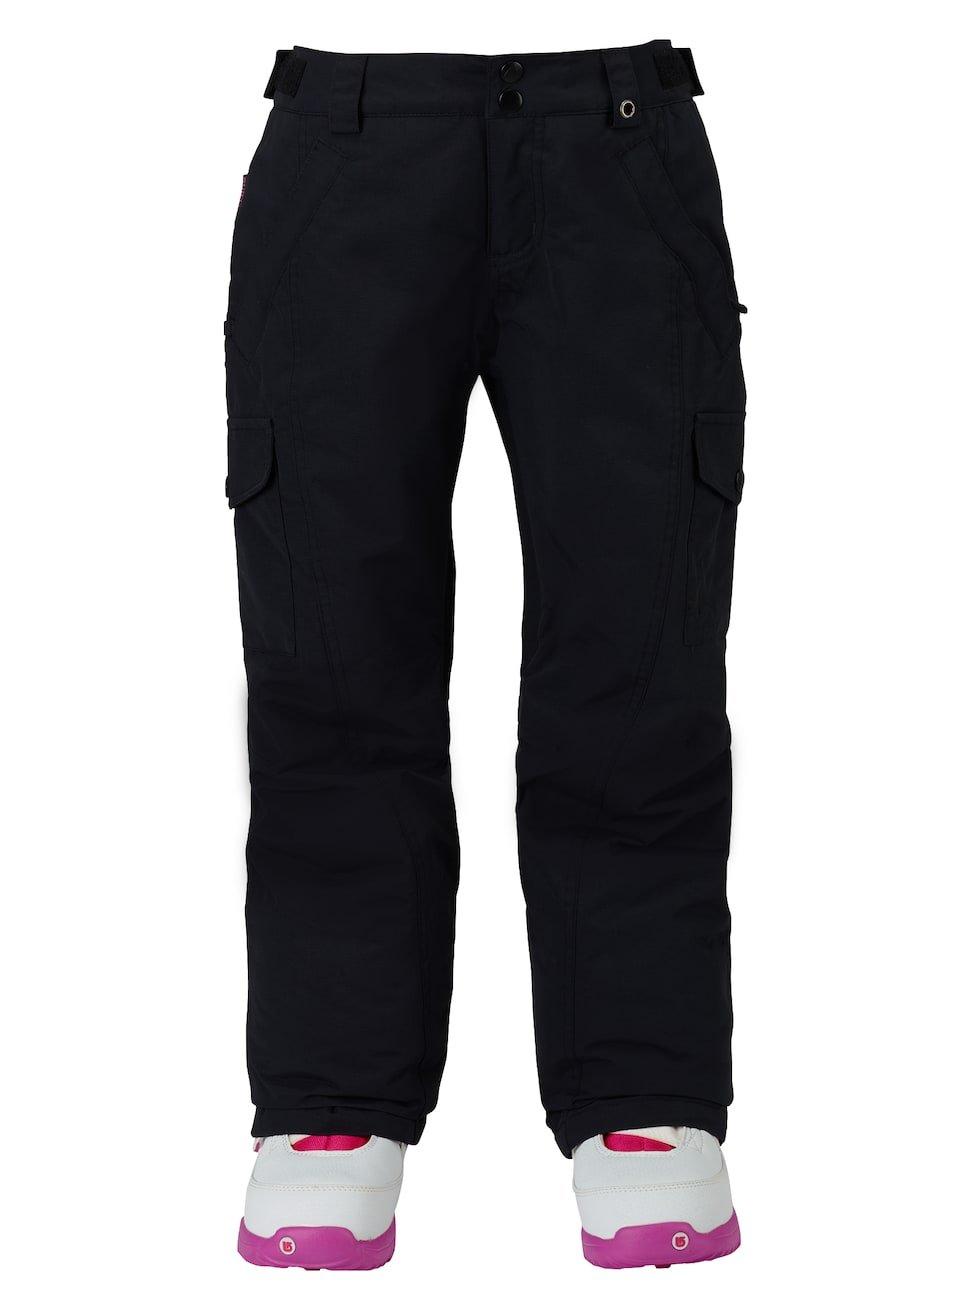 Burton Girls Elite Cargo Pant, True Black, X-Small by Burton